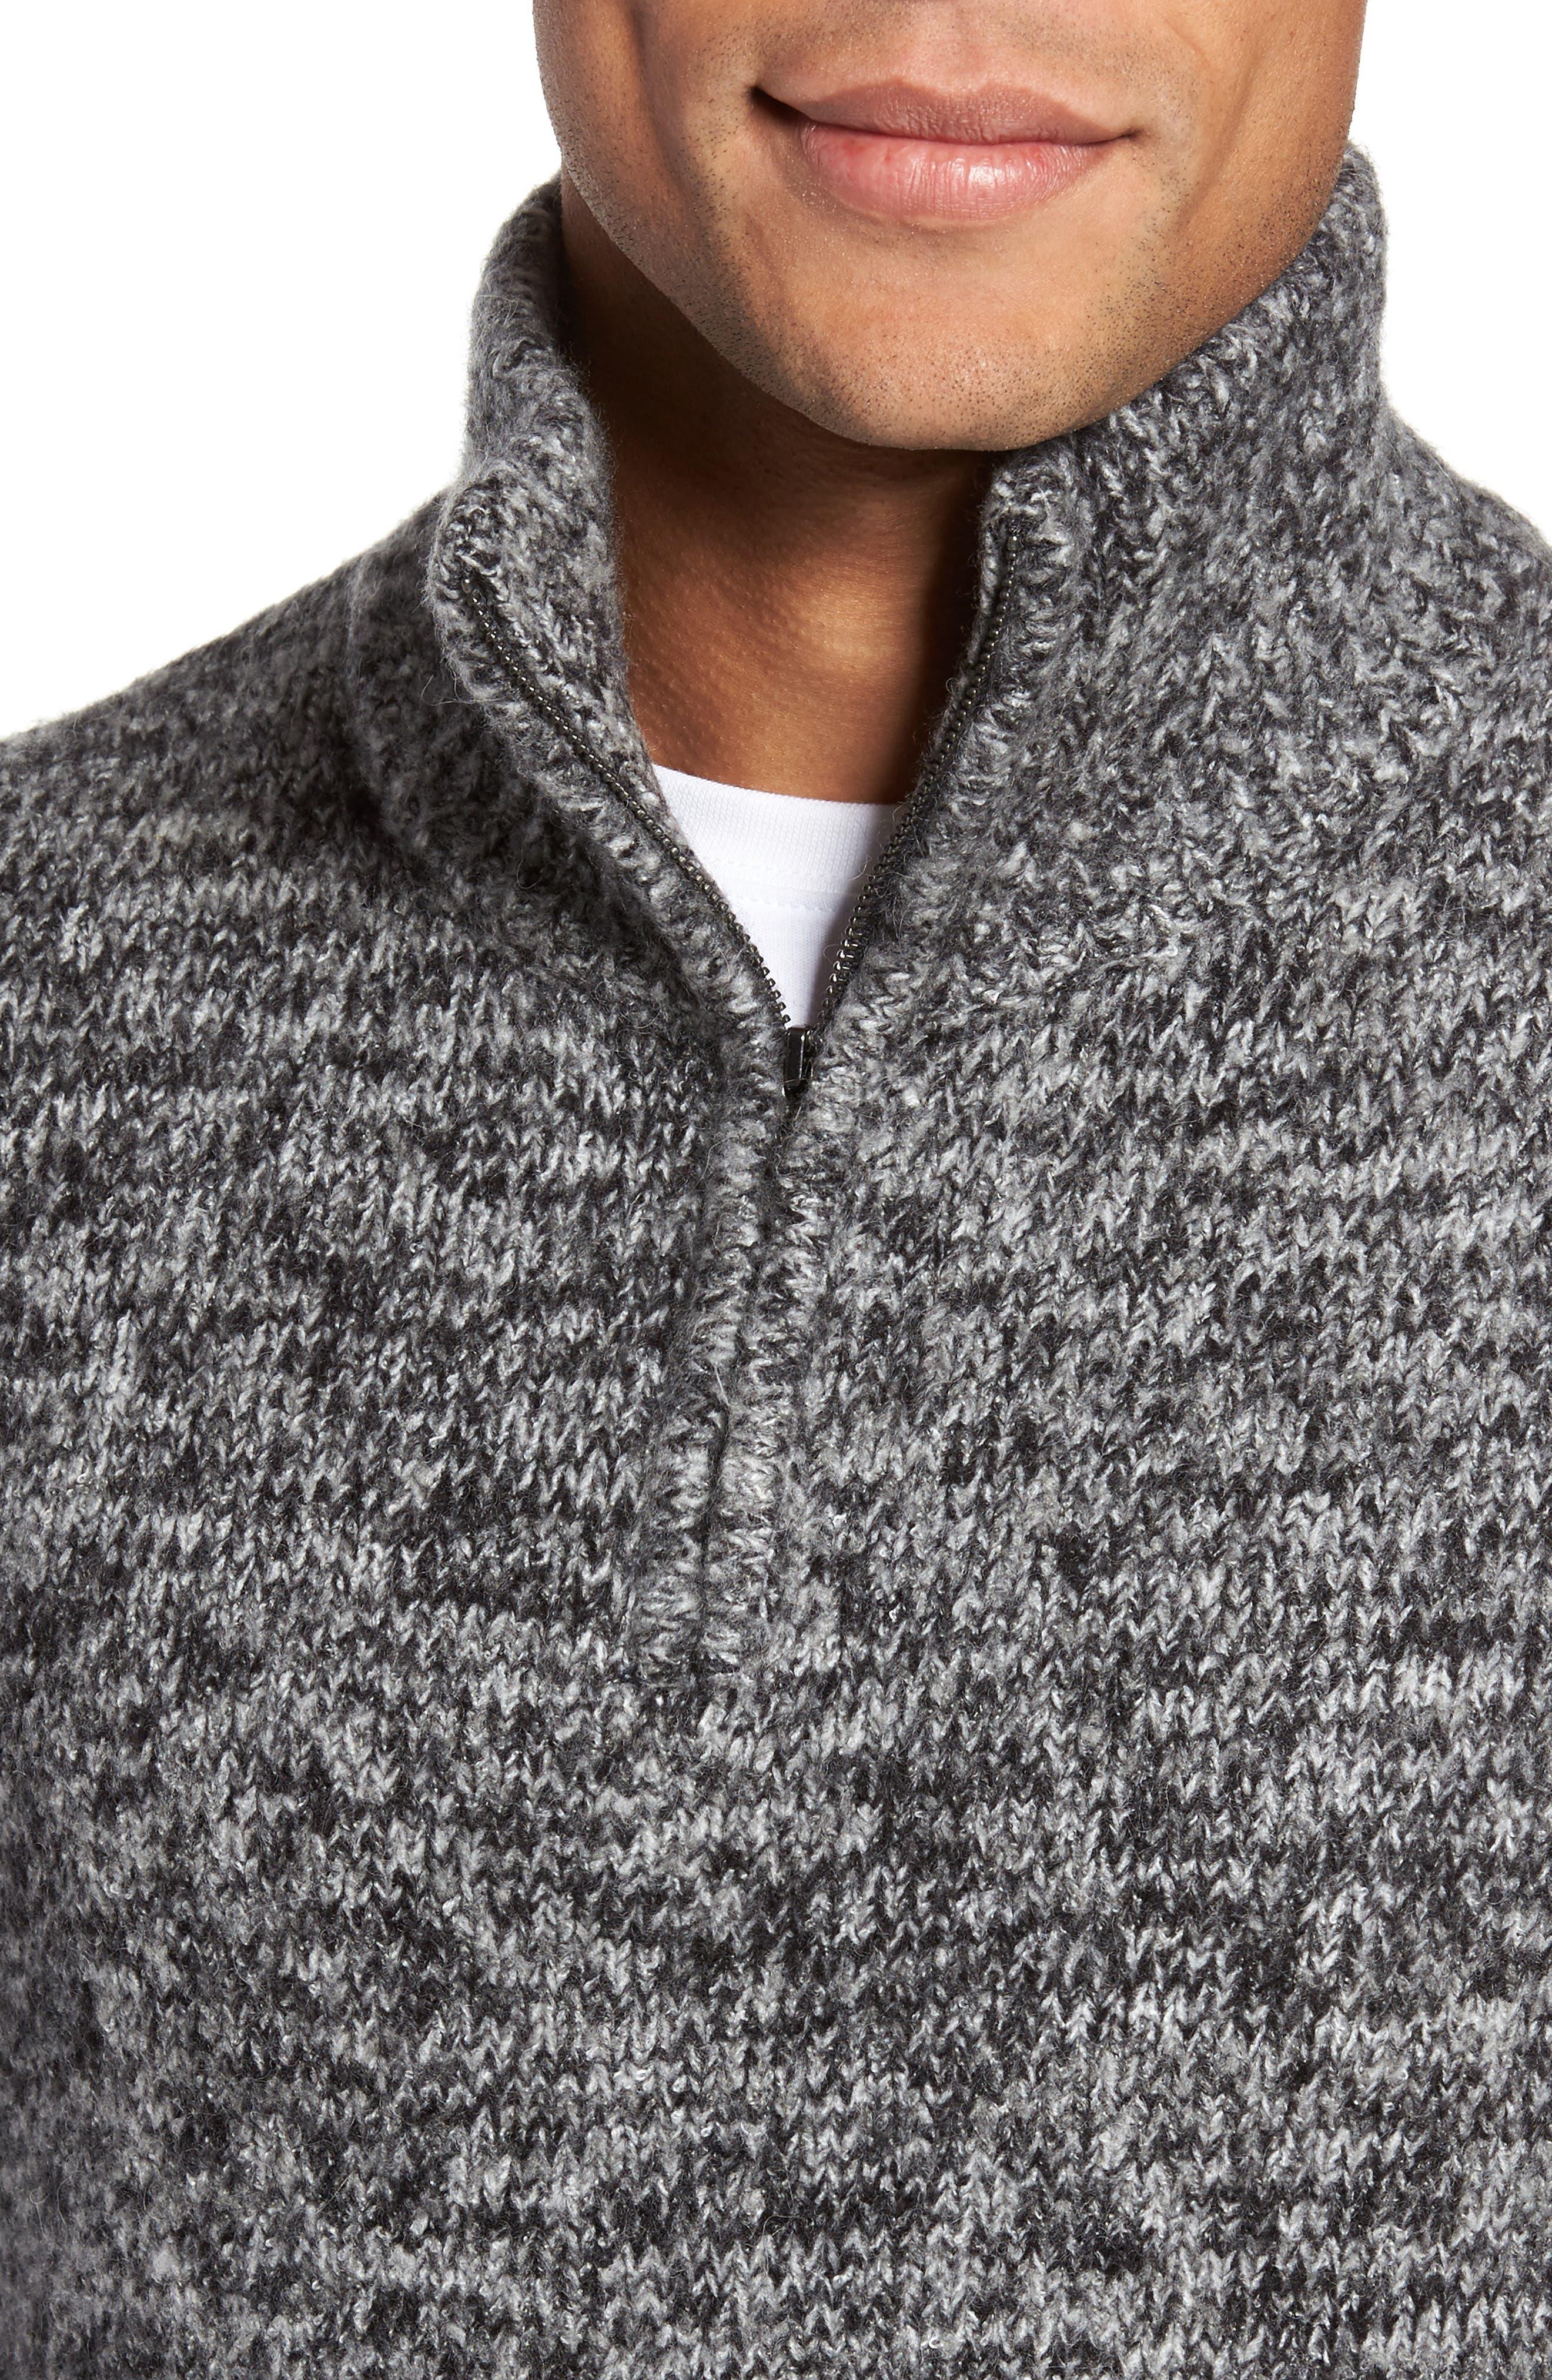 Quarter Zip Knit Pullover,                             Alternate thumbnail 4, color,                             012